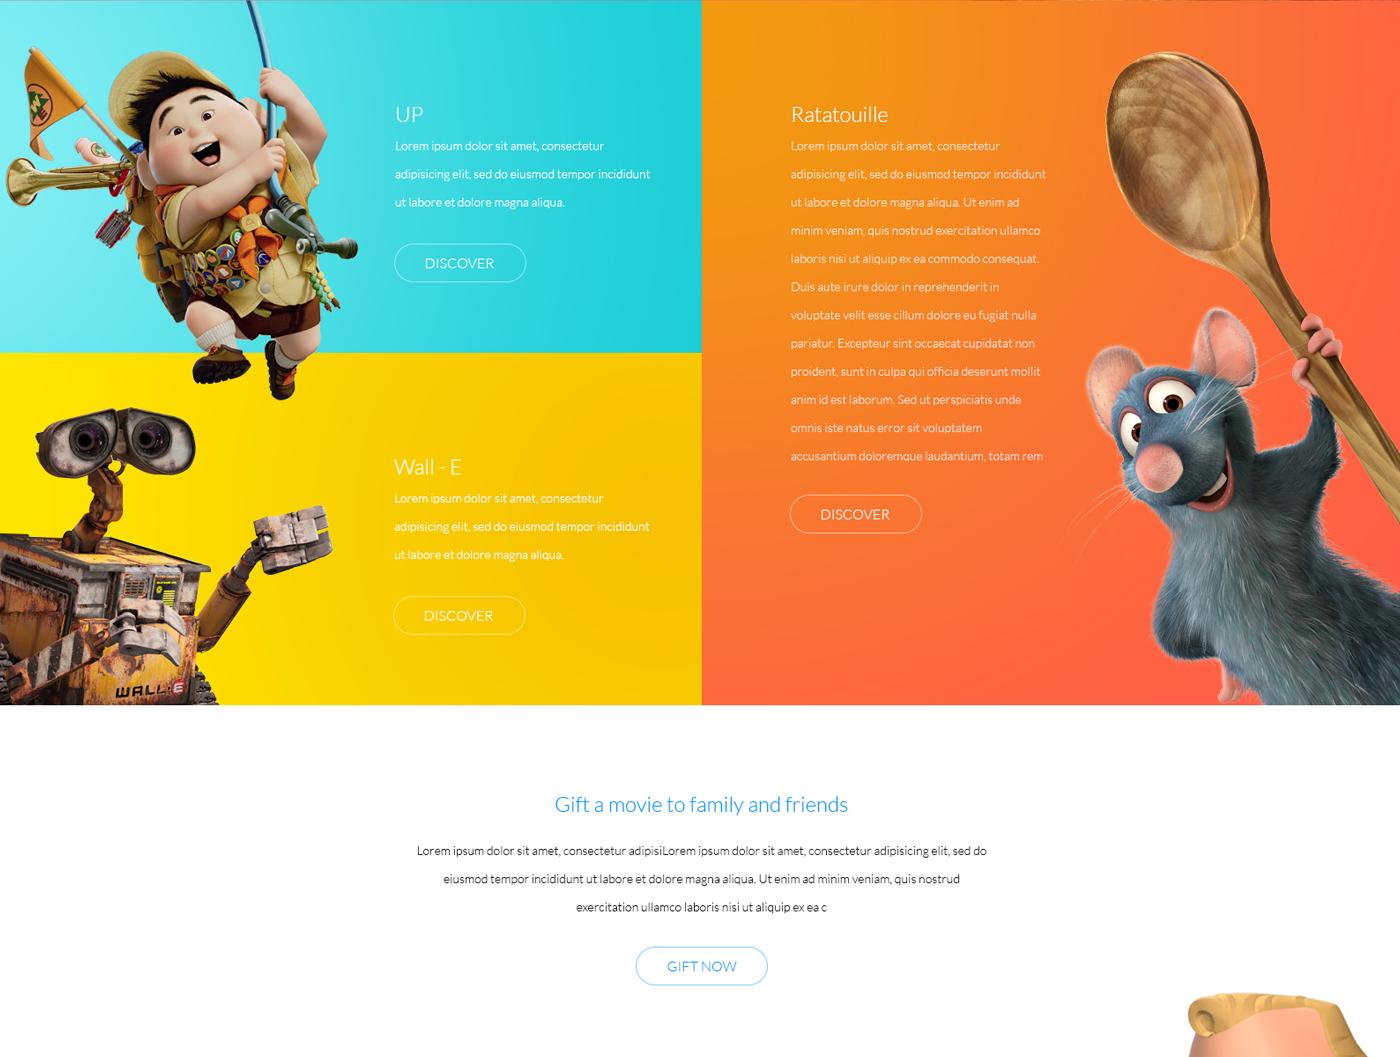 pixar movie studio animation studios minimalistic Whitespace apple Steve Jobs characters Renderman apple watch watch app interactive design Responsive logo Webdesign